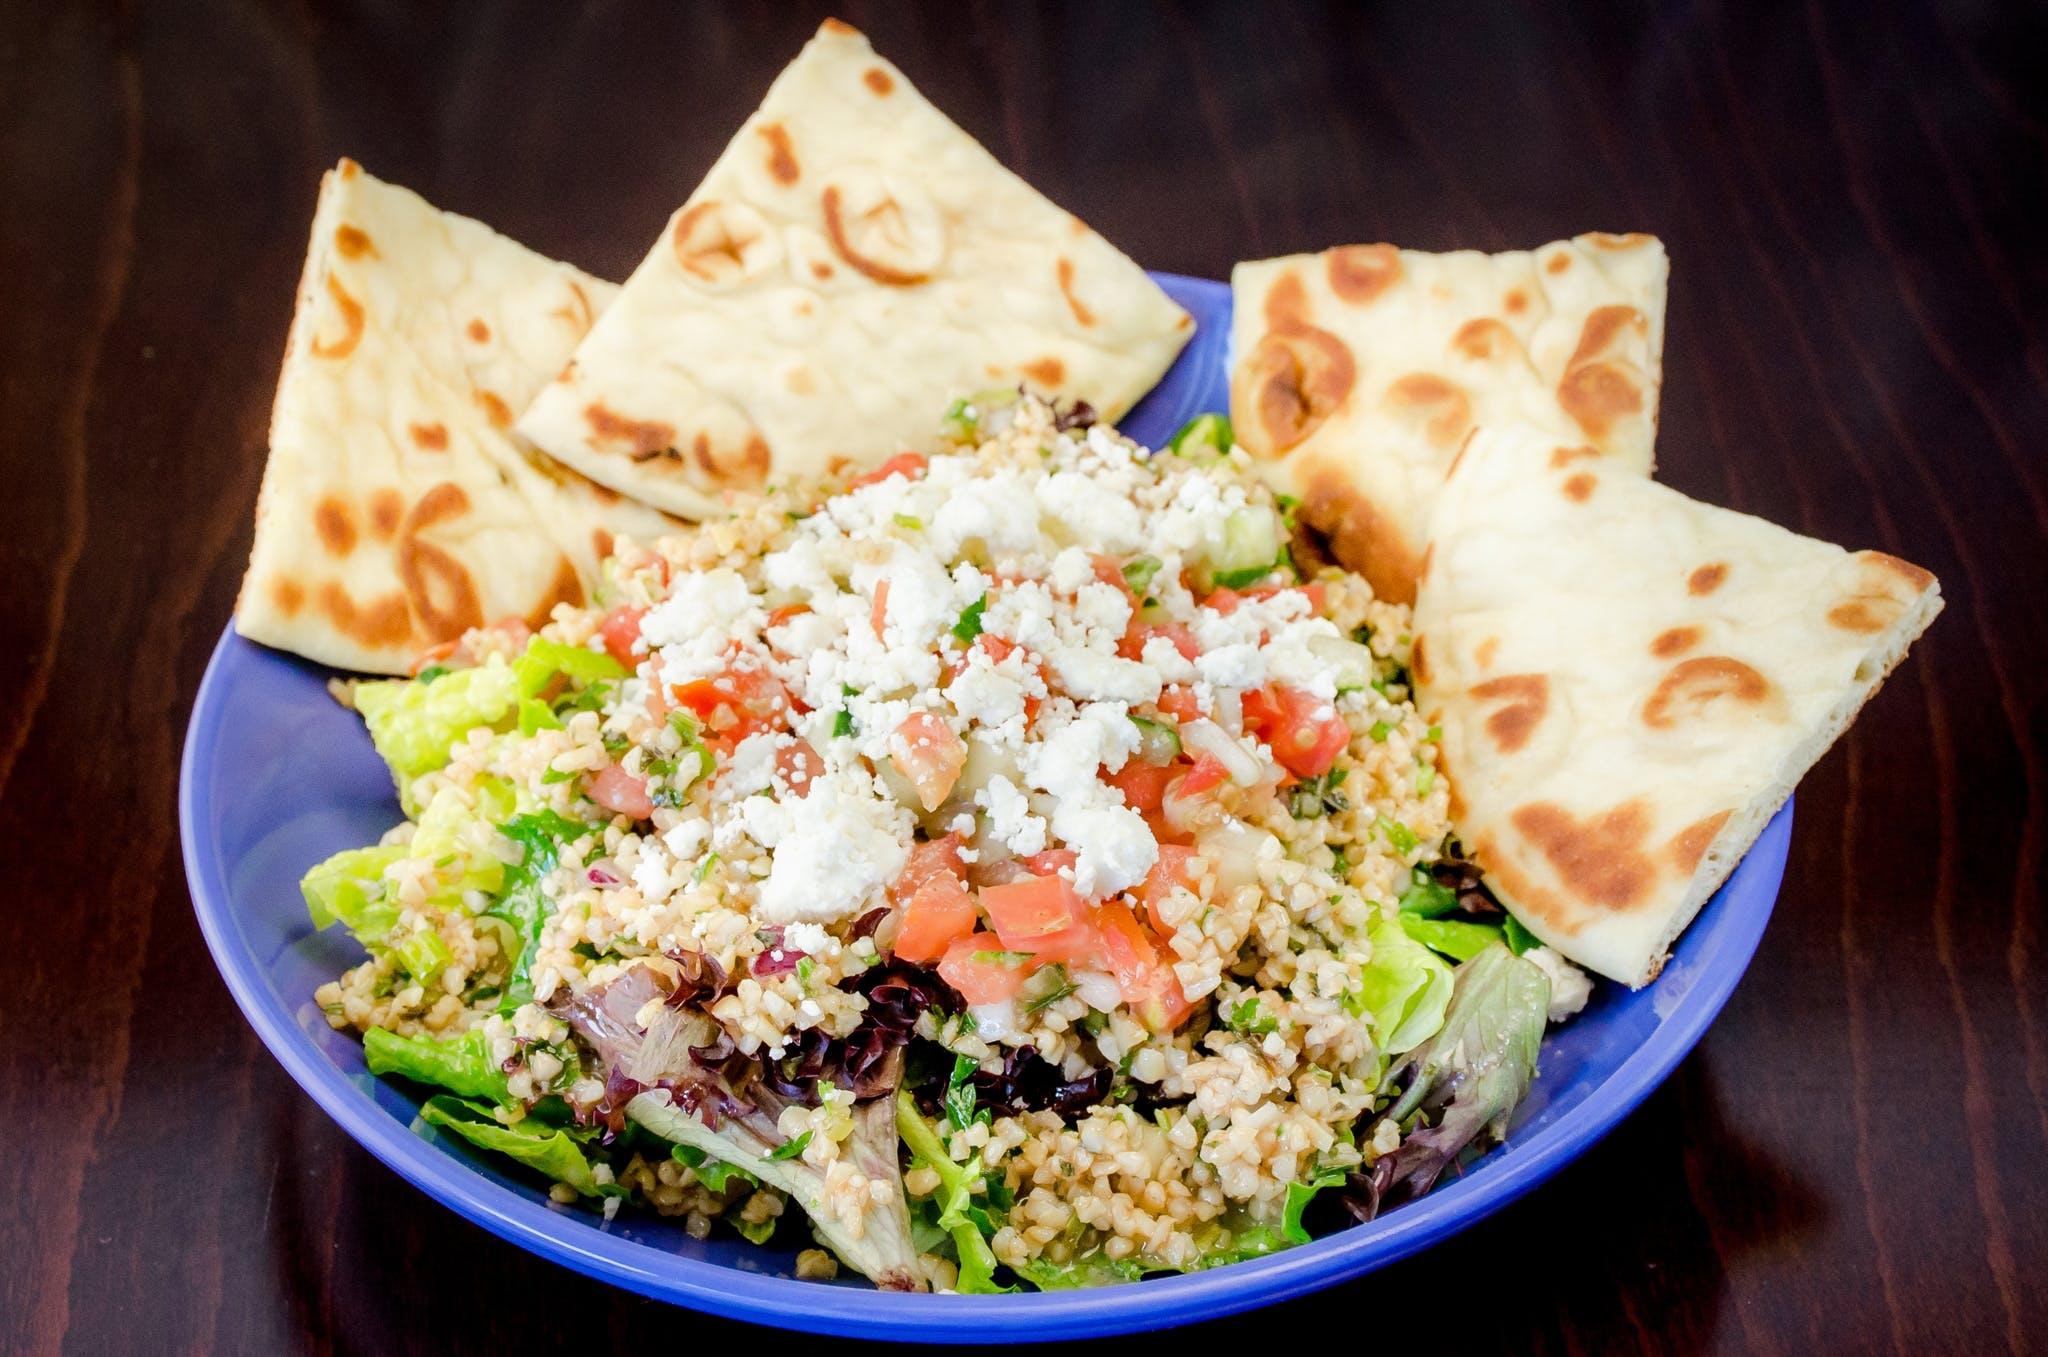 Tabouleh Salad from Freska Mediterranean Grill in Middleton, WI